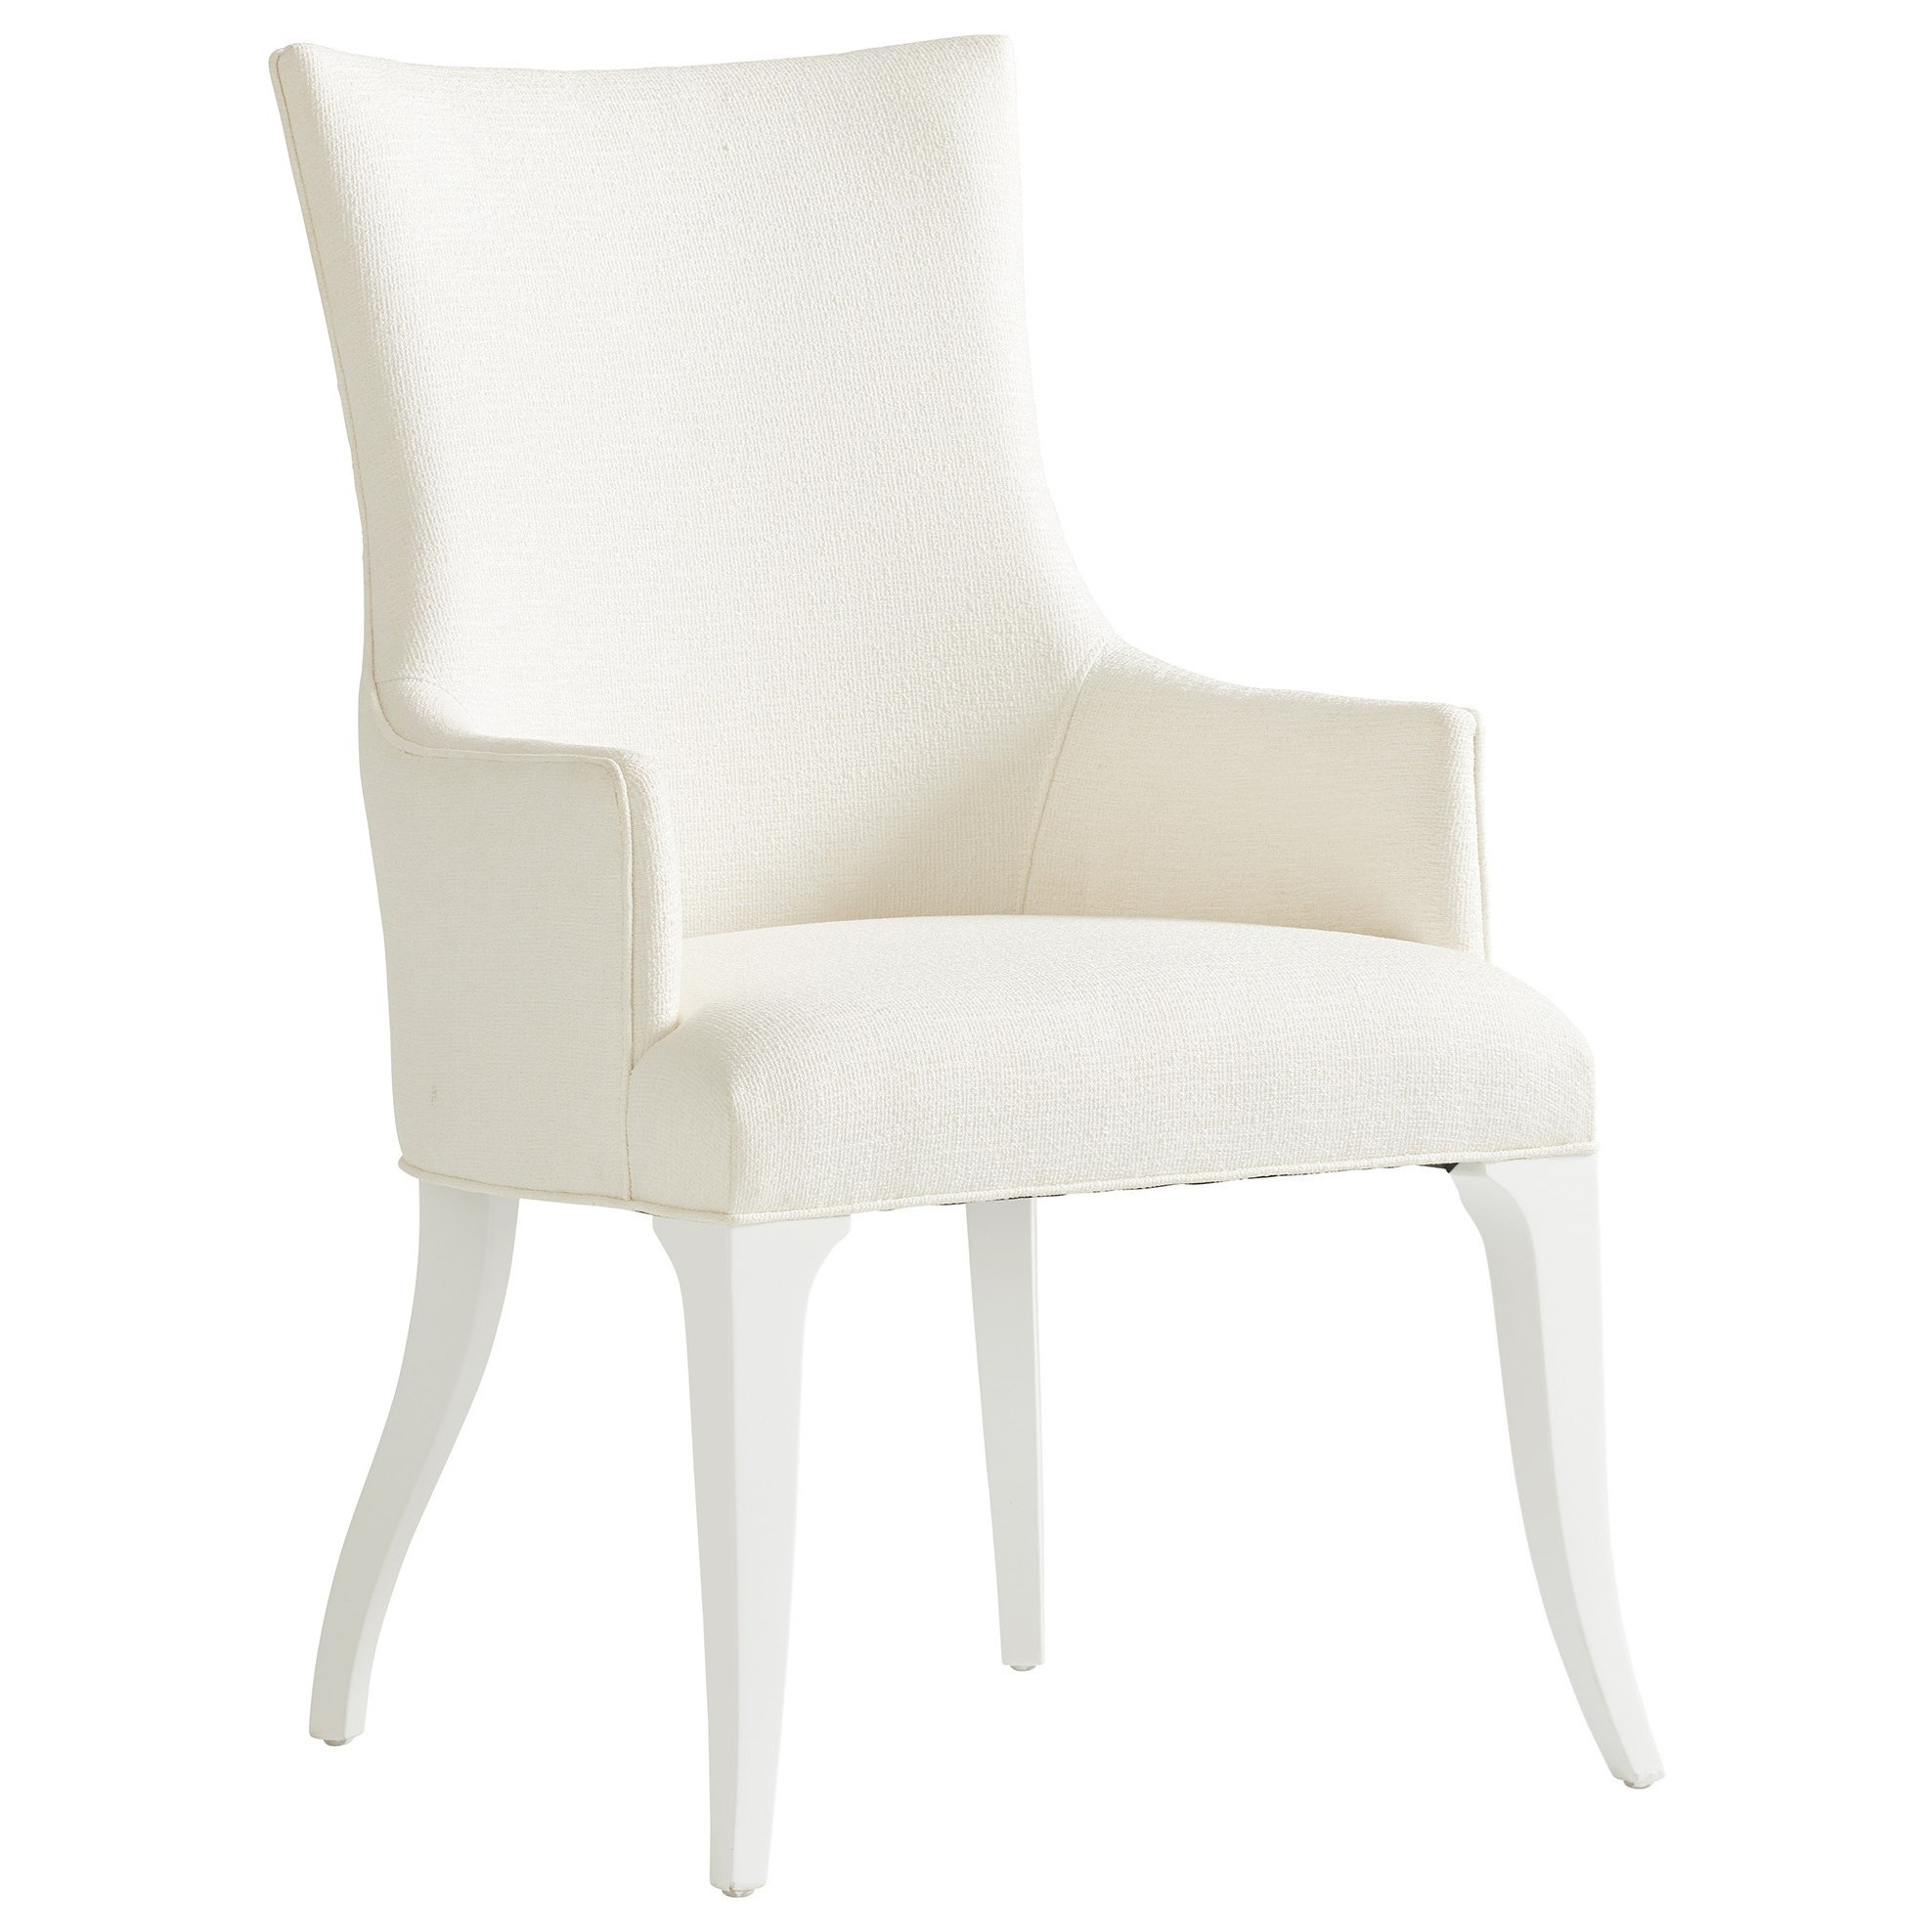 Avondale Geneva Upholstered Arm Chair by Lexington at Johnny Janosik